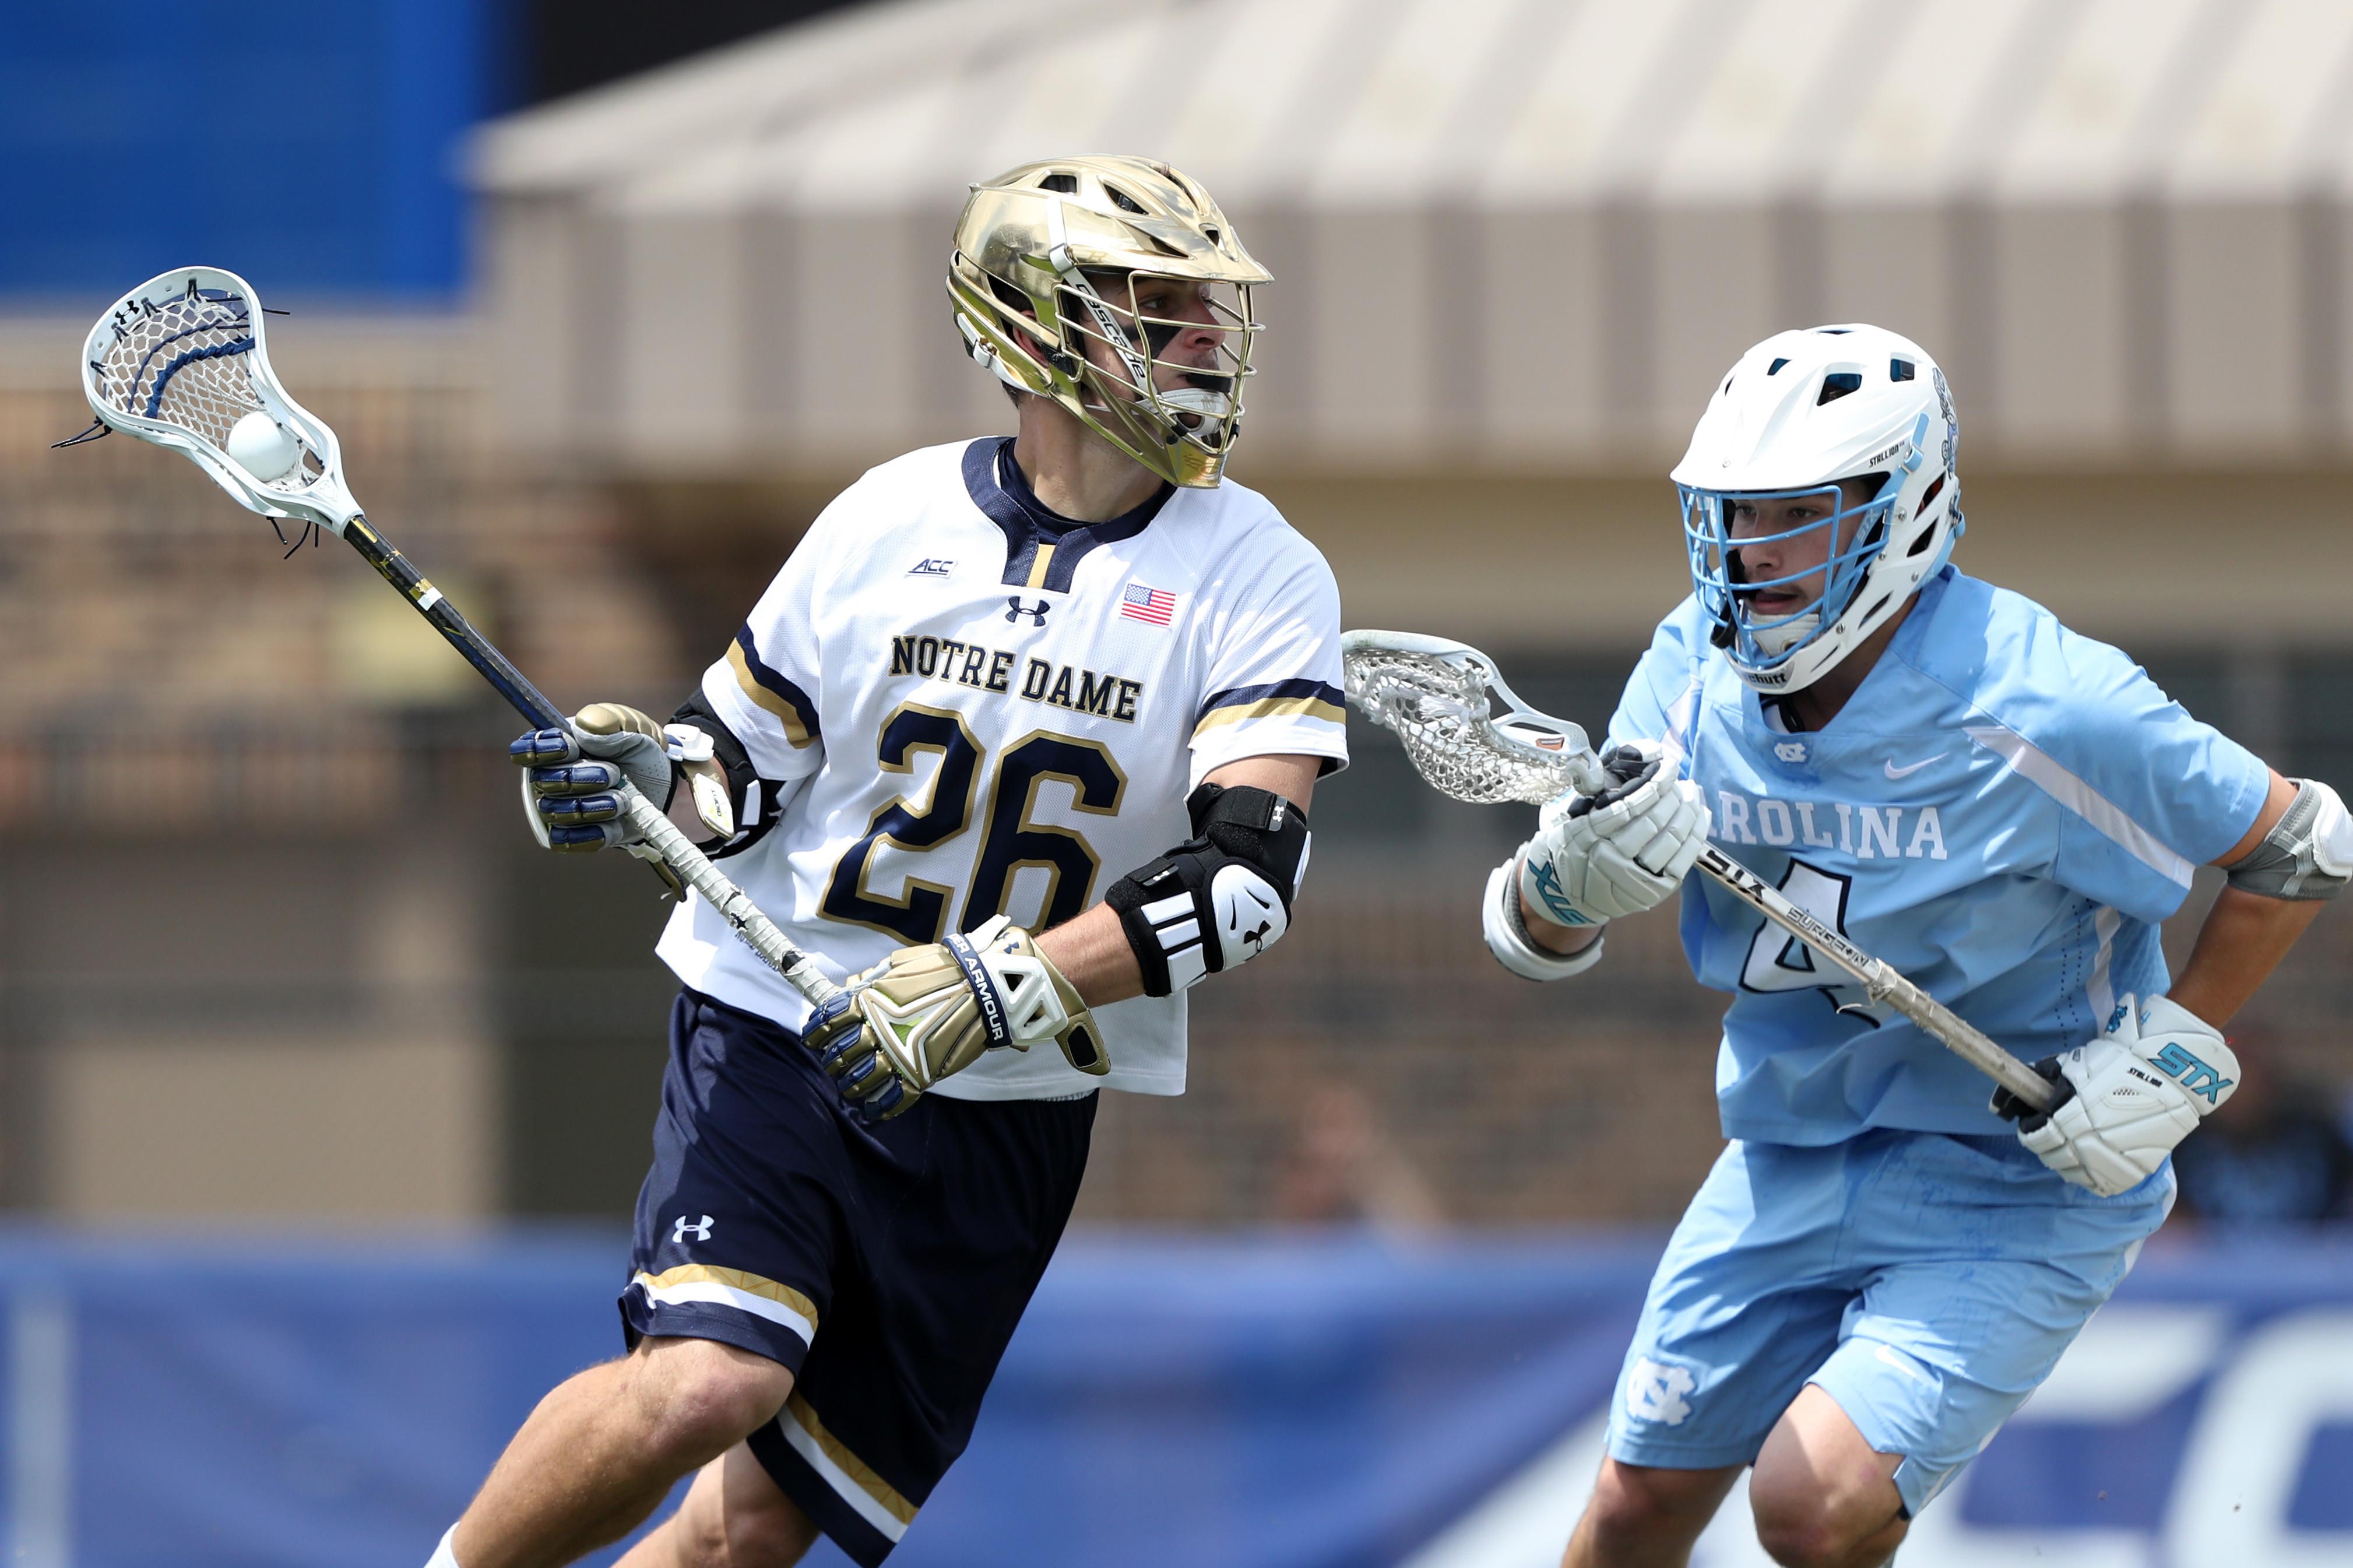 COLLEGE LACROSSE: APR 30 ACC Final - Notre Dame v North Carolina